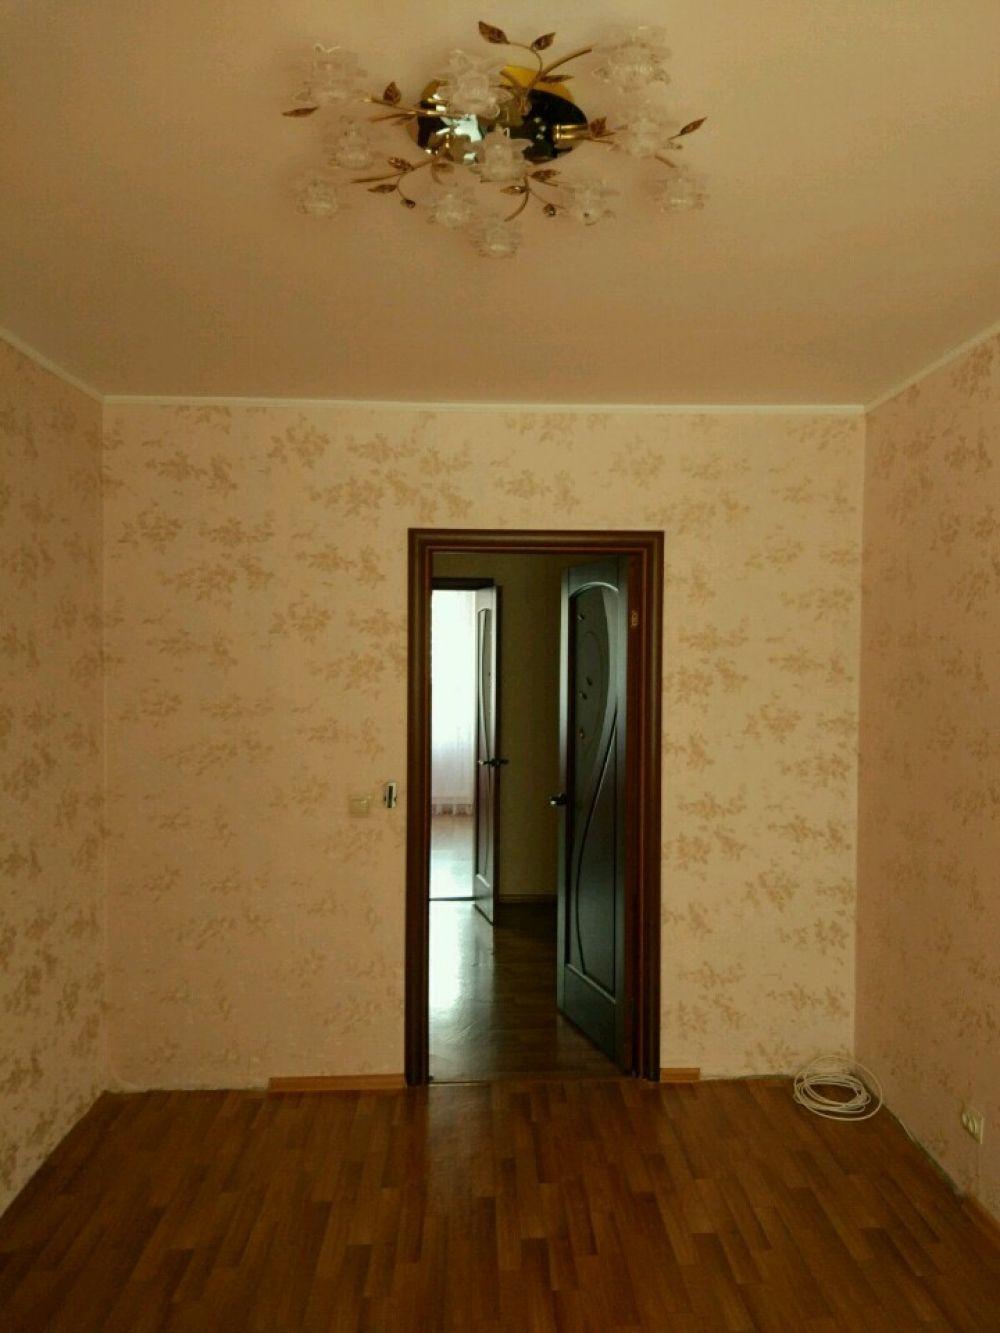 Трехкомнатная квартира, 87 м2, Богородский мкр 10/2, Щелково, фото 9